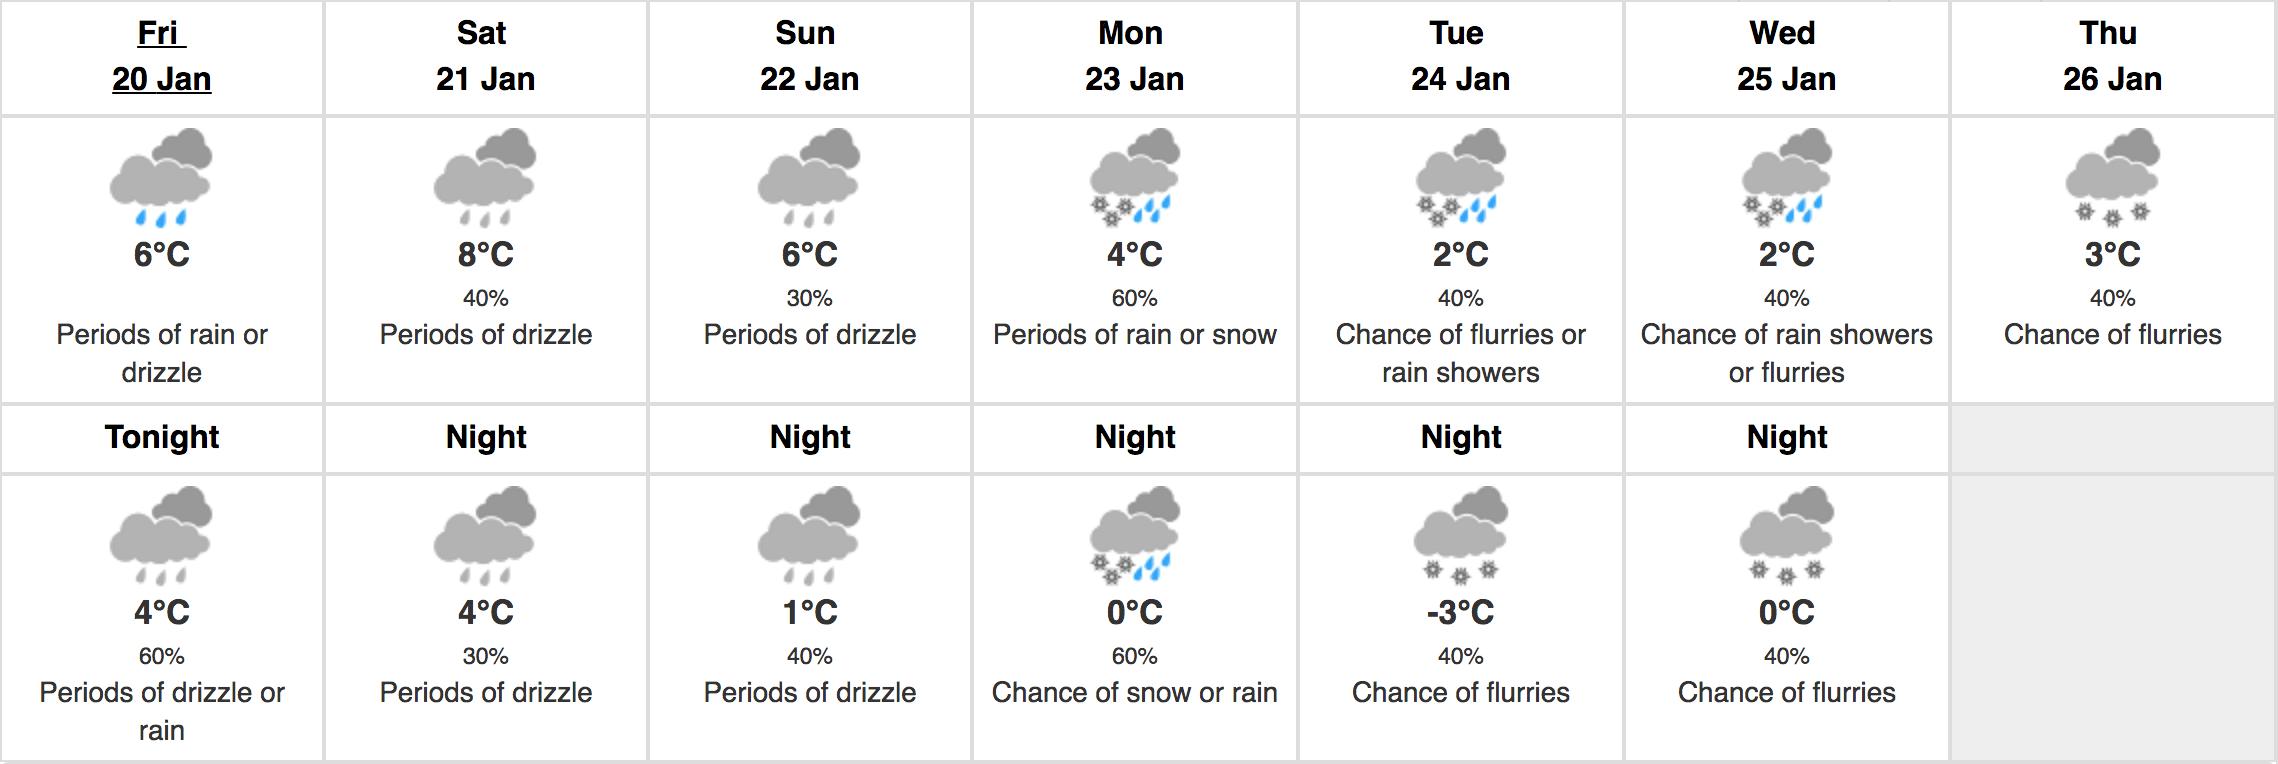 Weather jan 20